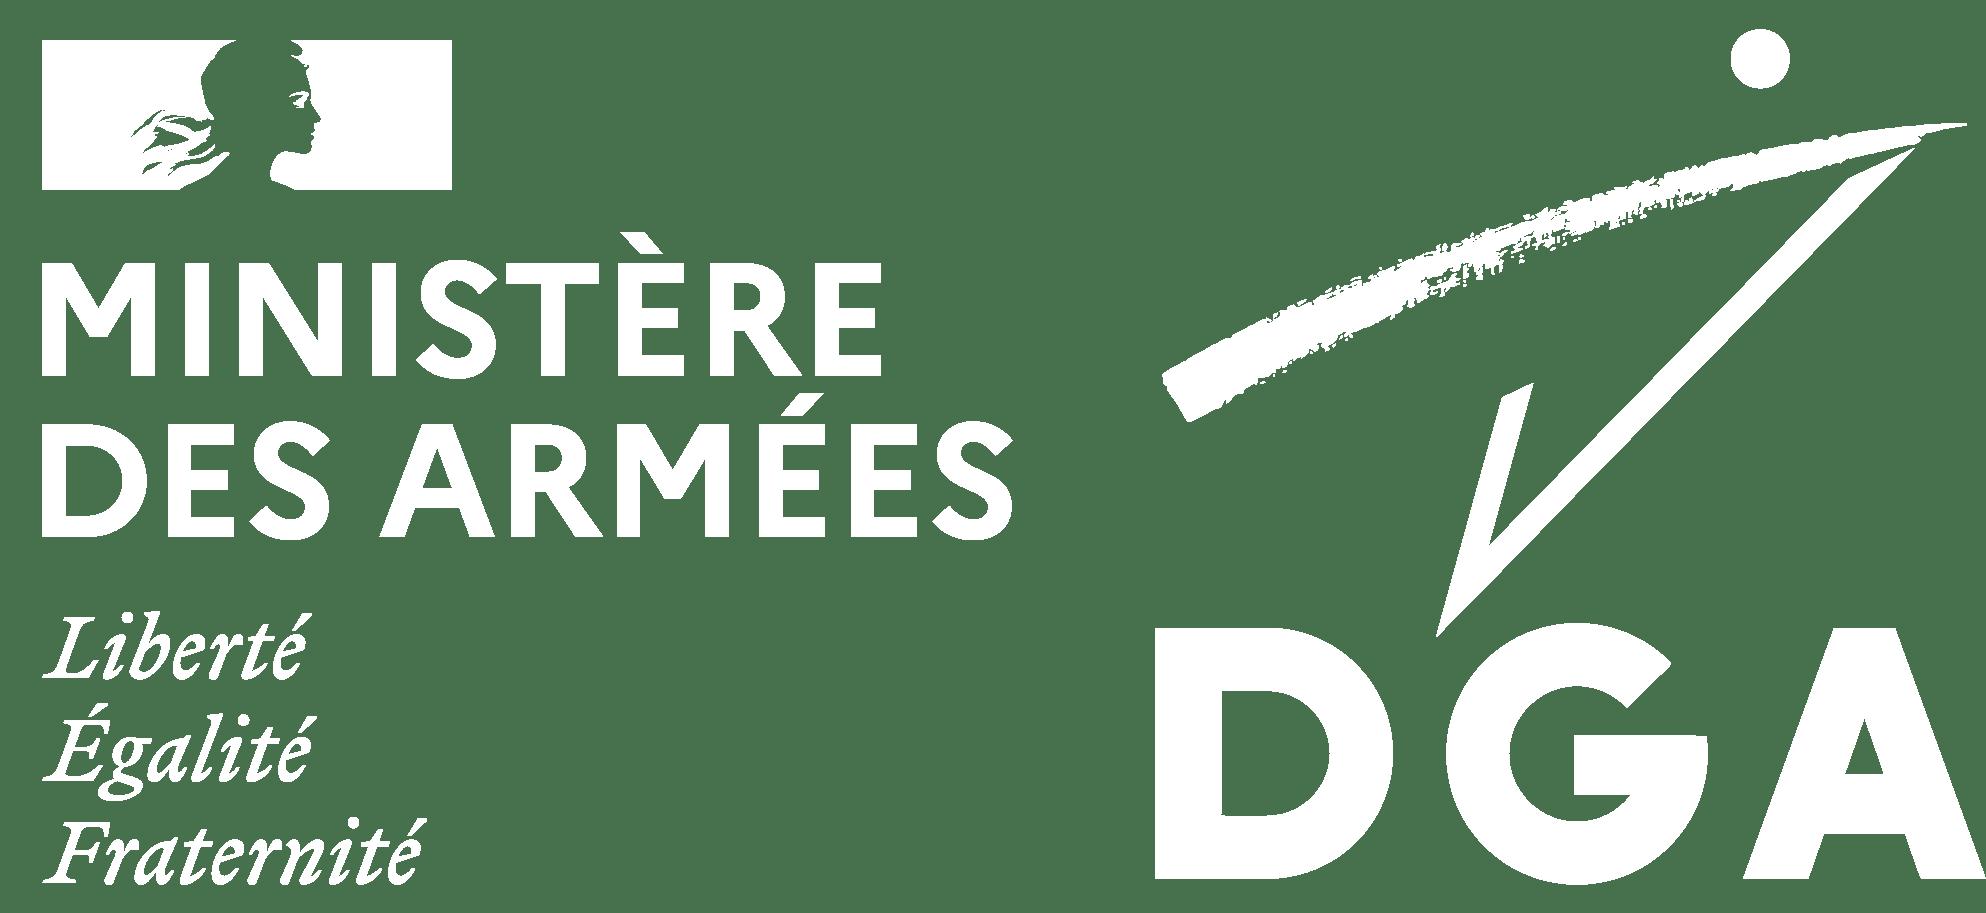 Logo Dga Plan De Travail 1 Copie